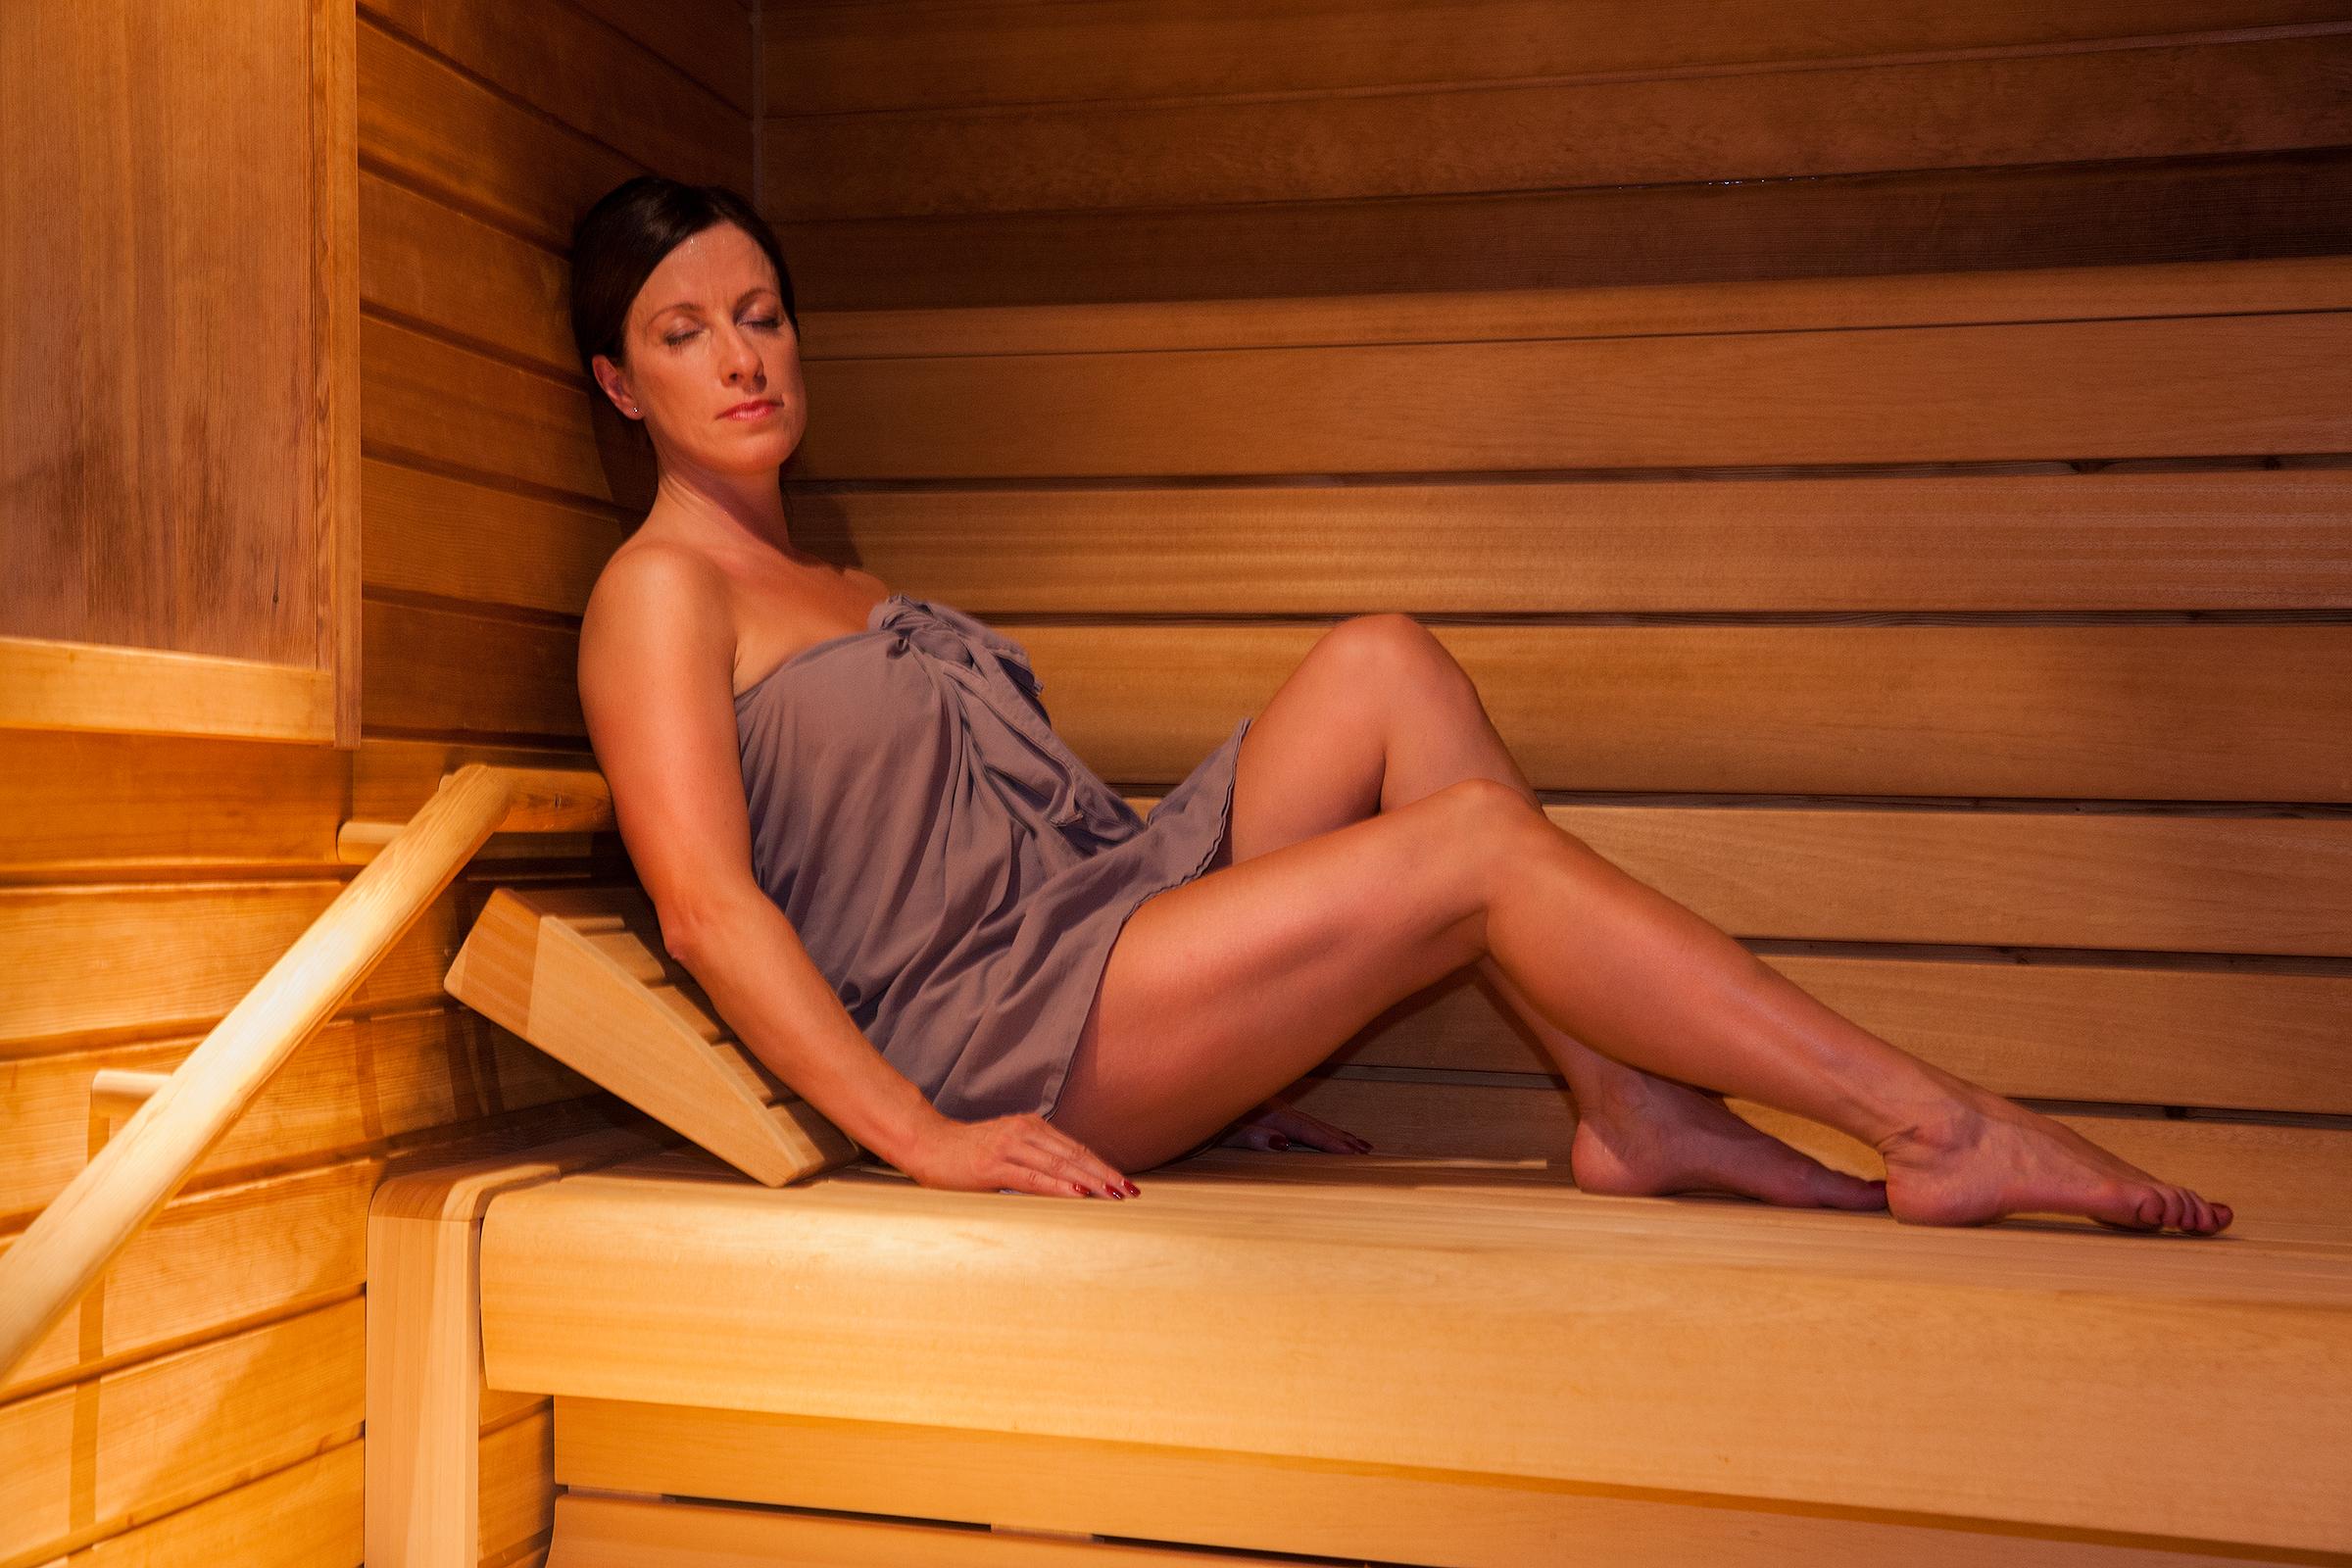 devushki-v-sauna-onlayn-roliki-negrami